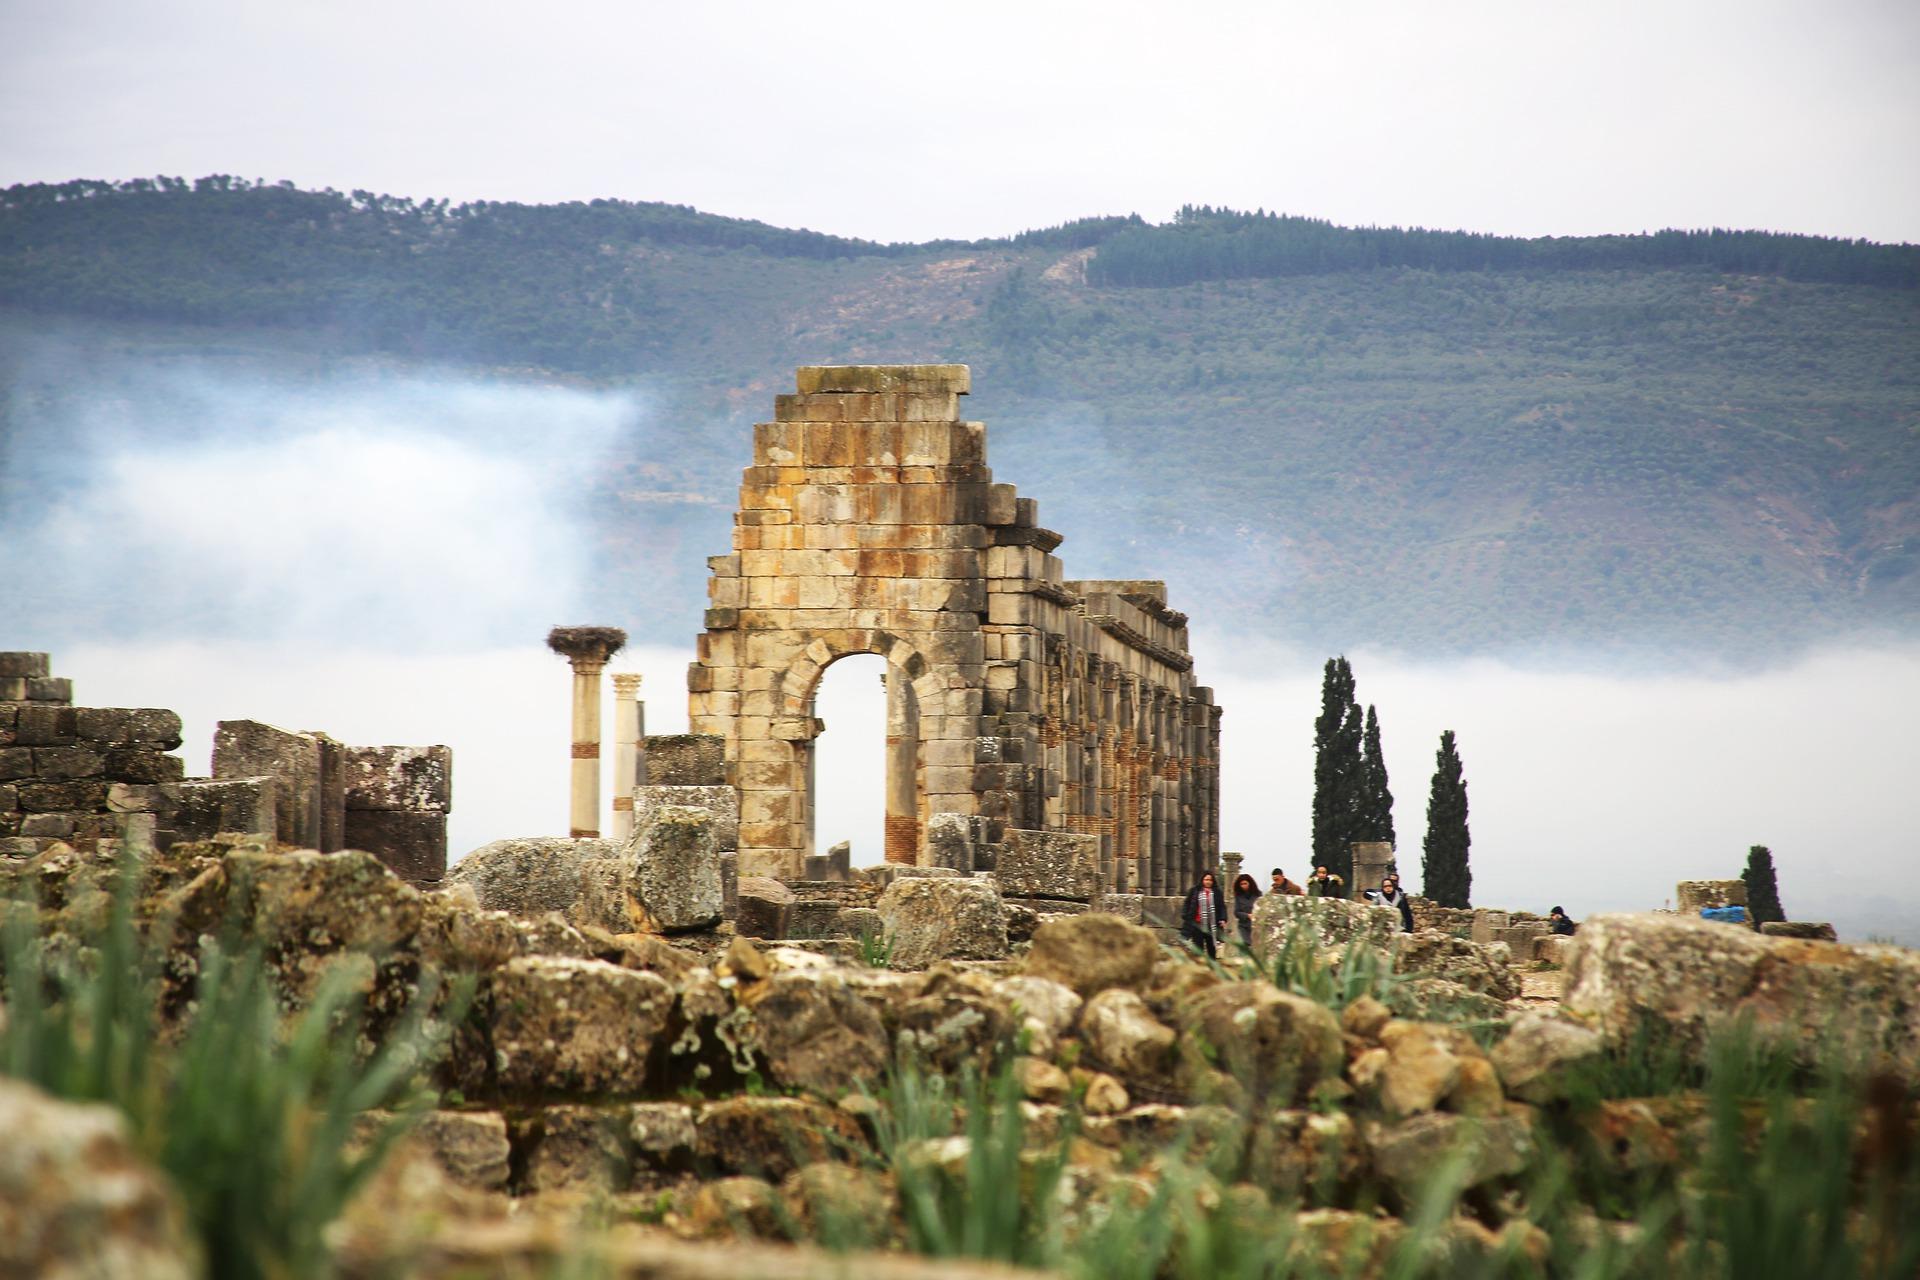 Sito archeologico Volubilis